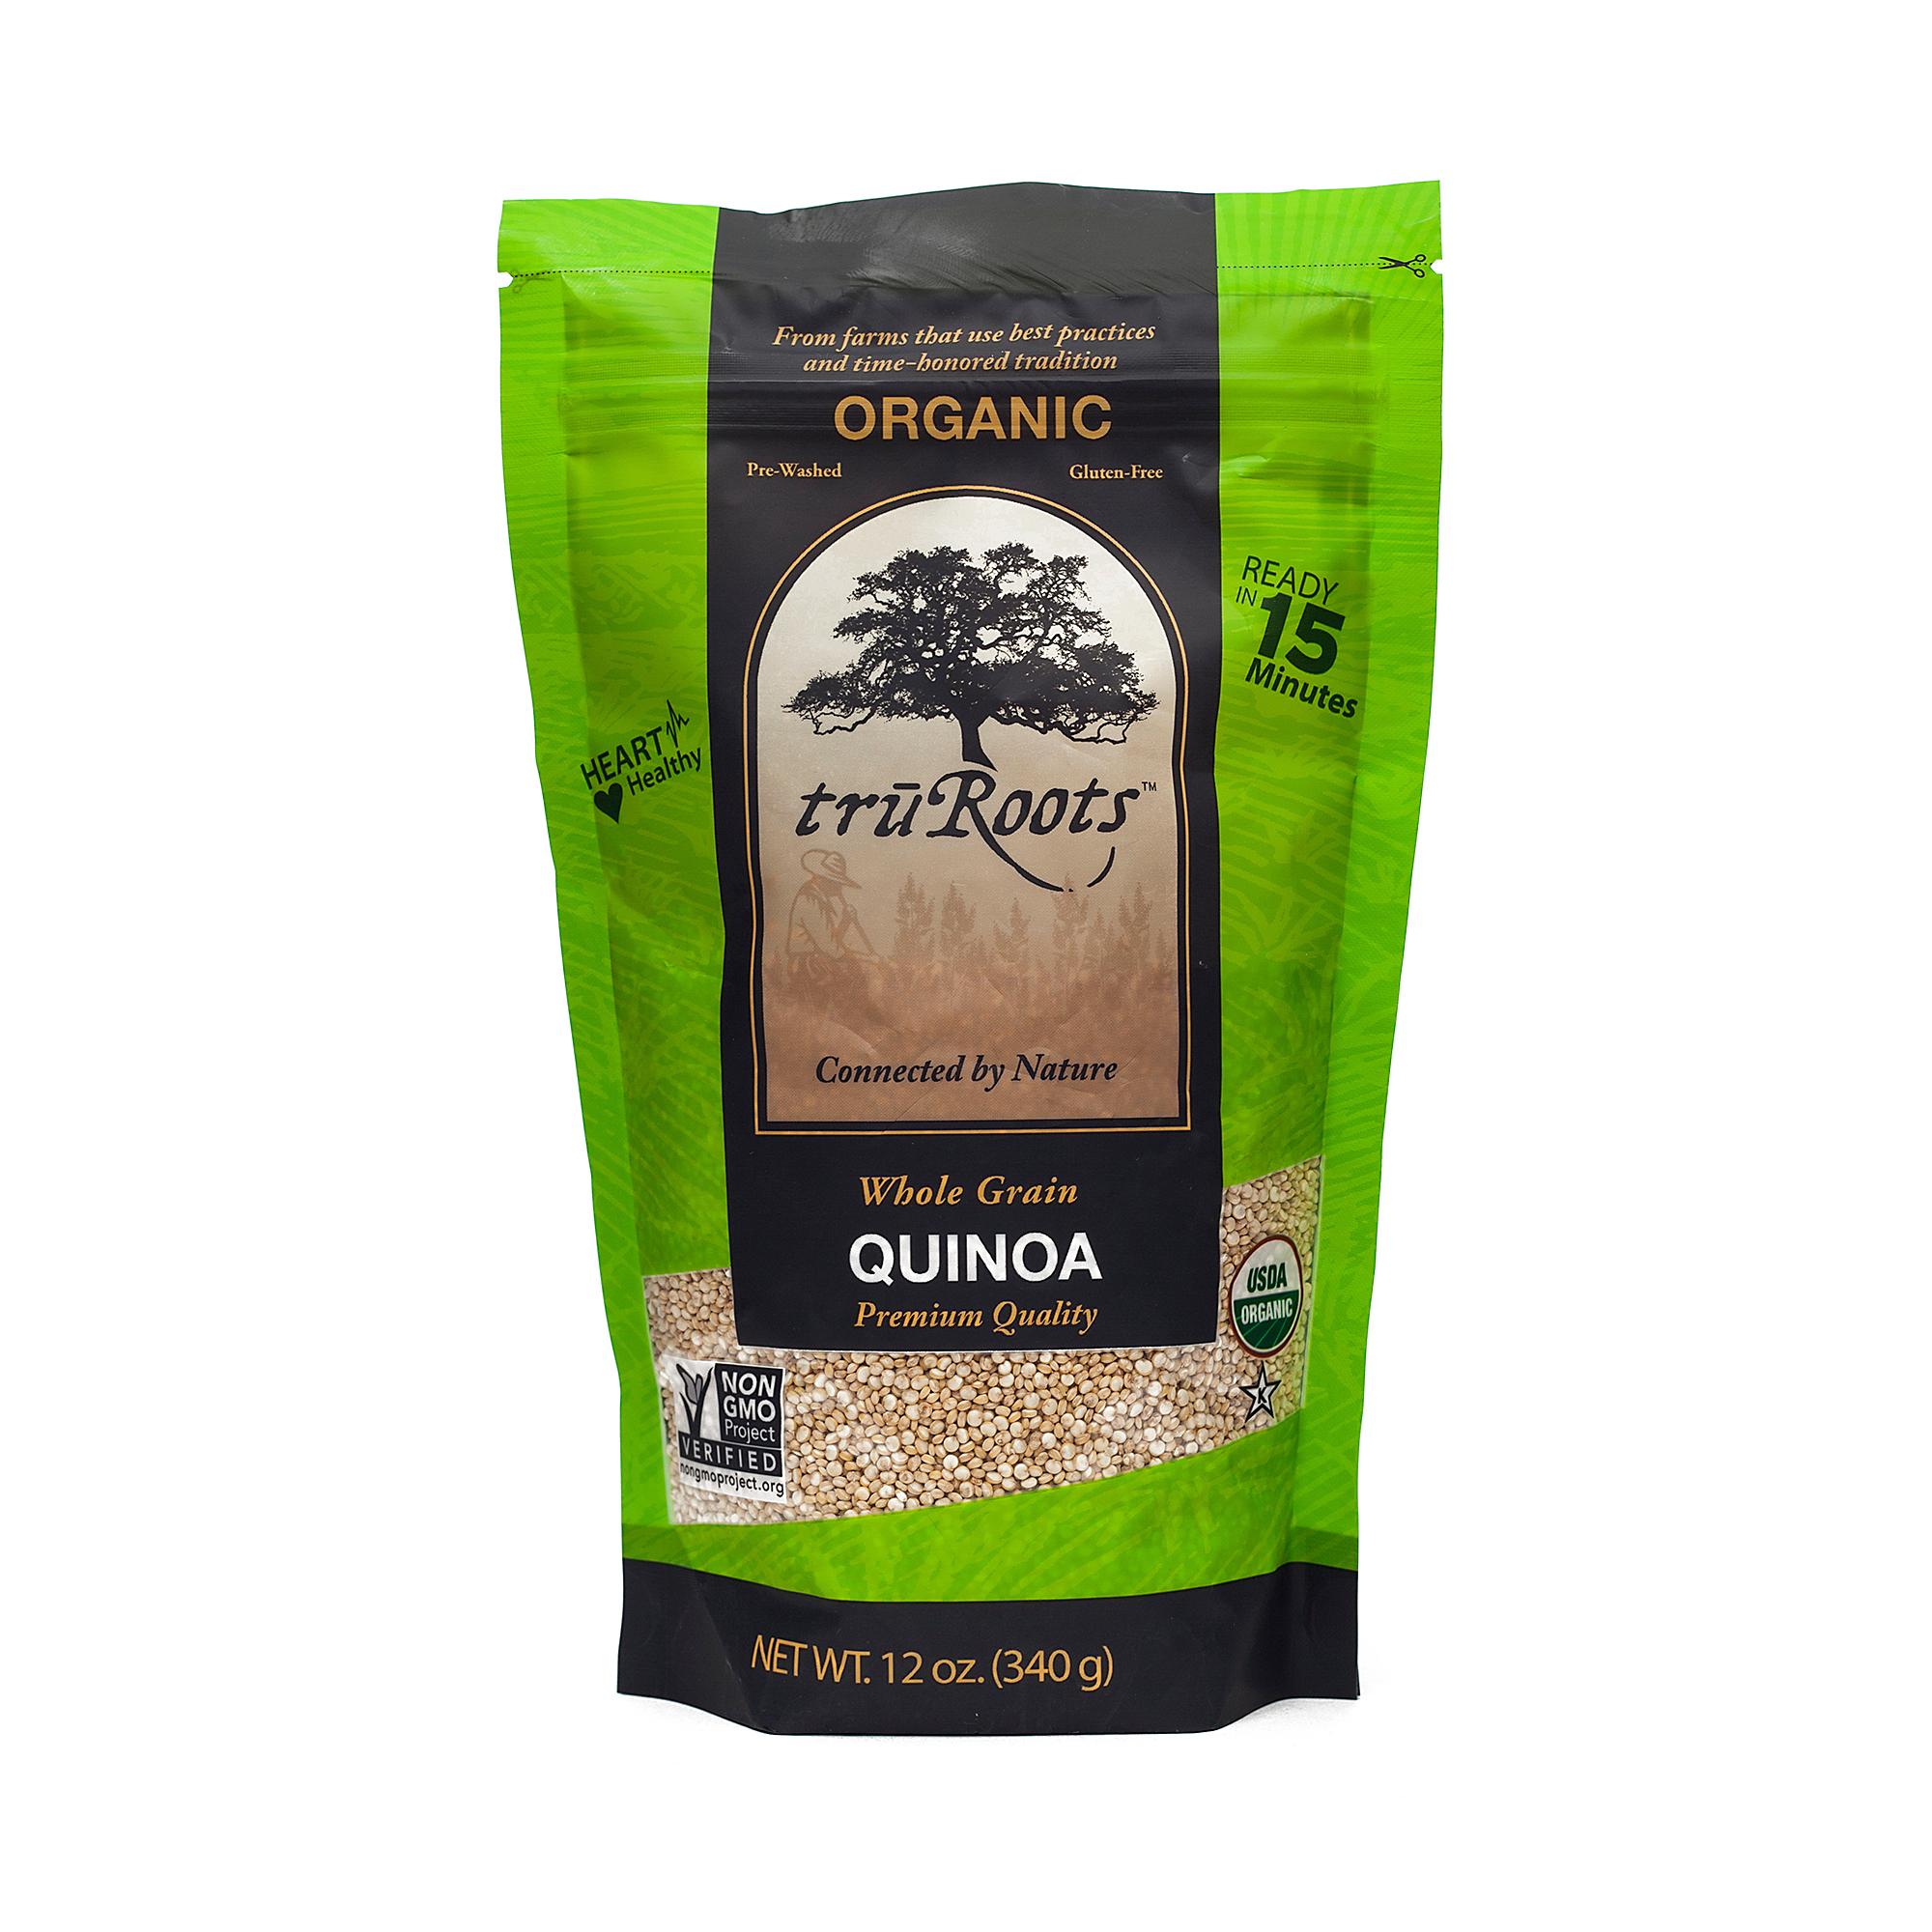 TruRoots Organic Whole Grain Quinoa 12 oz bag